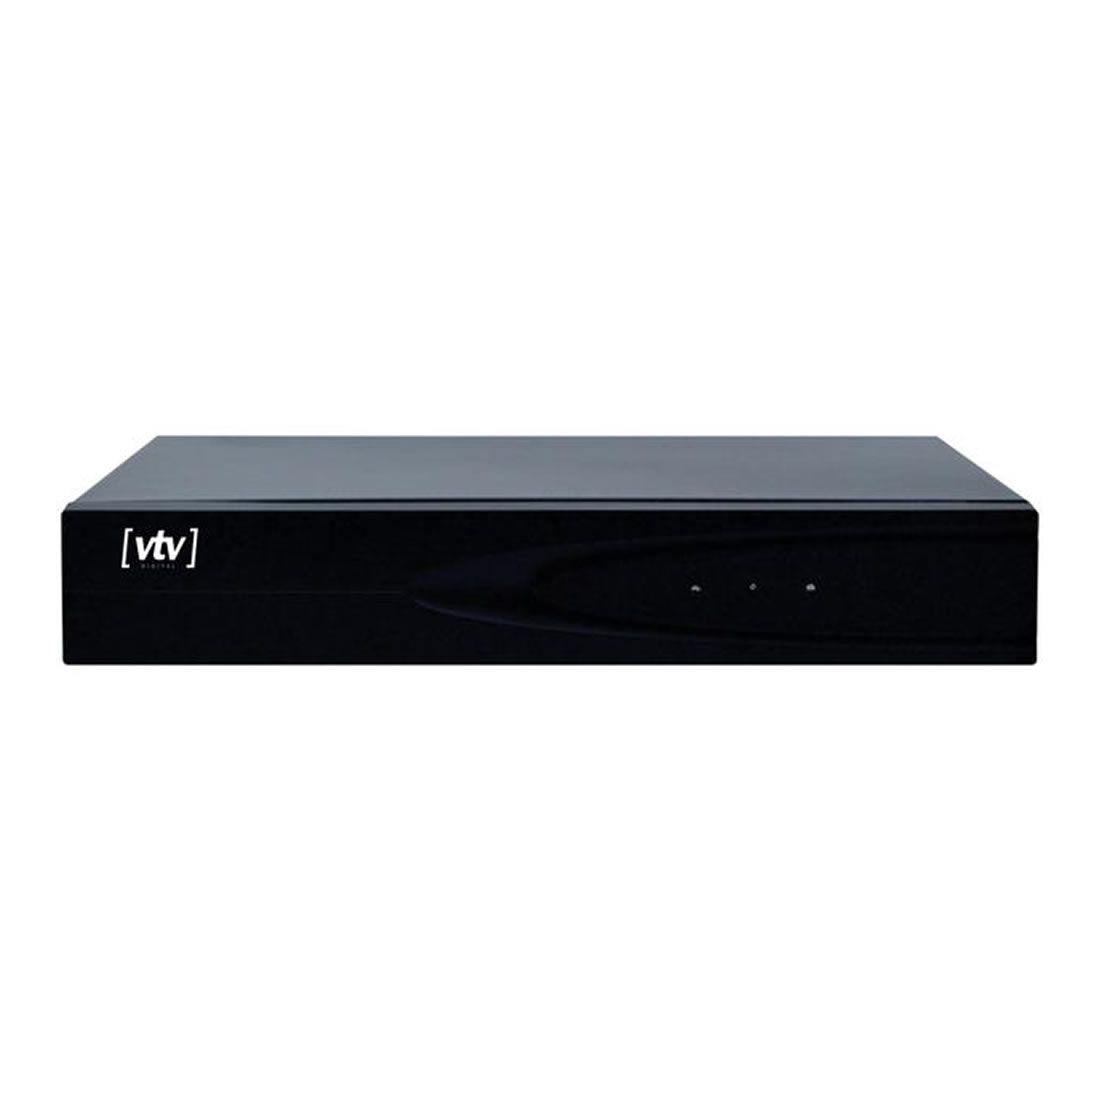 Kit DVR VTV 16 Canais AHD Com HD de 1TB 5X1 720p (1280X720p)